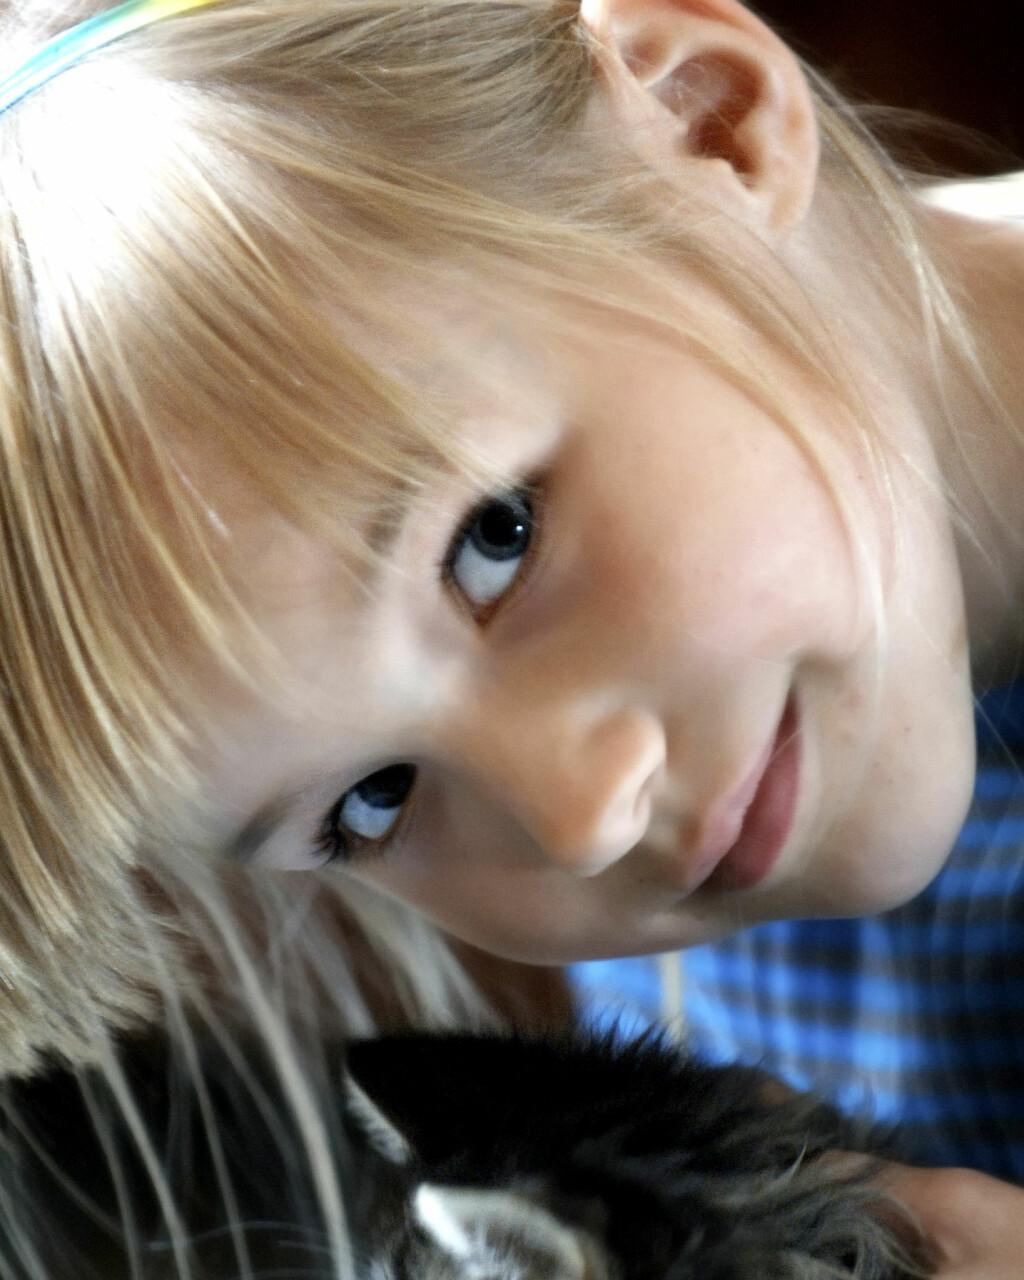 Colourbox.com:Illustrasjonfoto